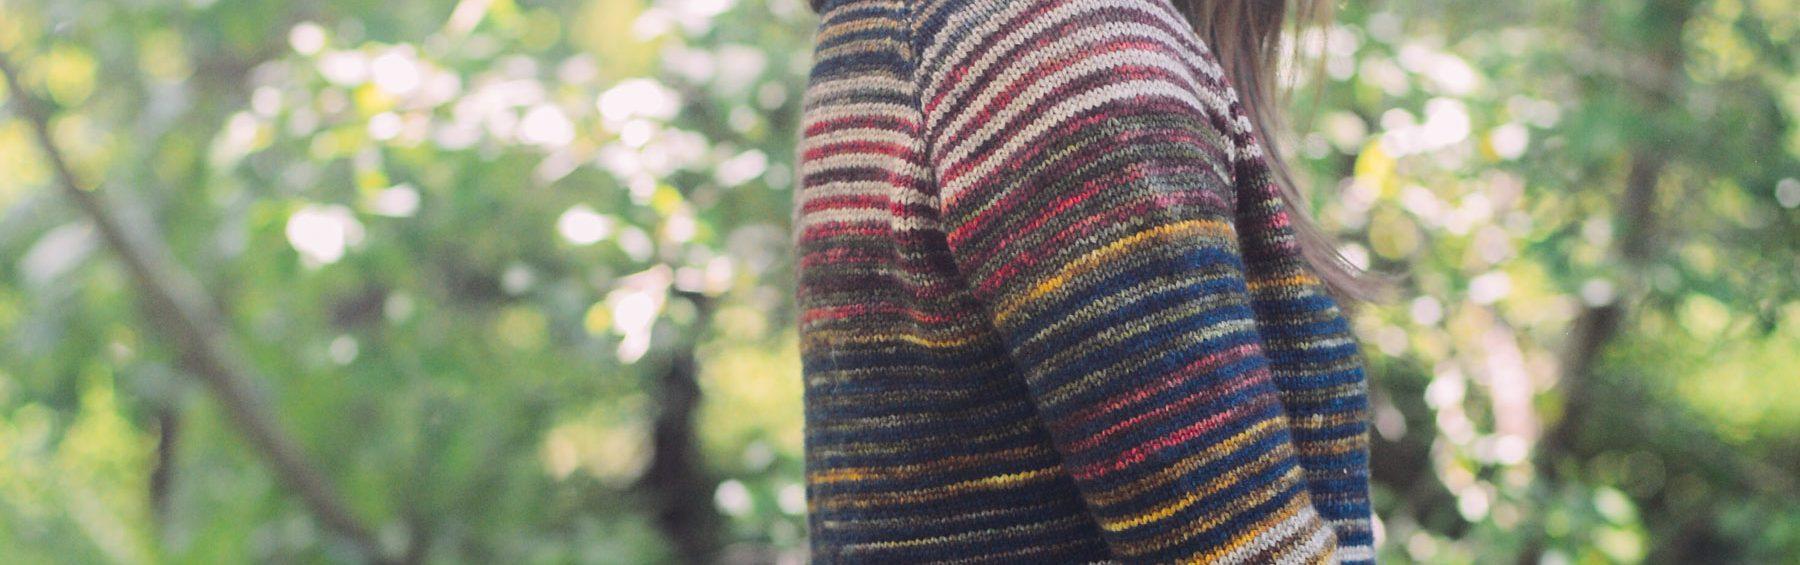 Lineage Sweater Knitting Pattern